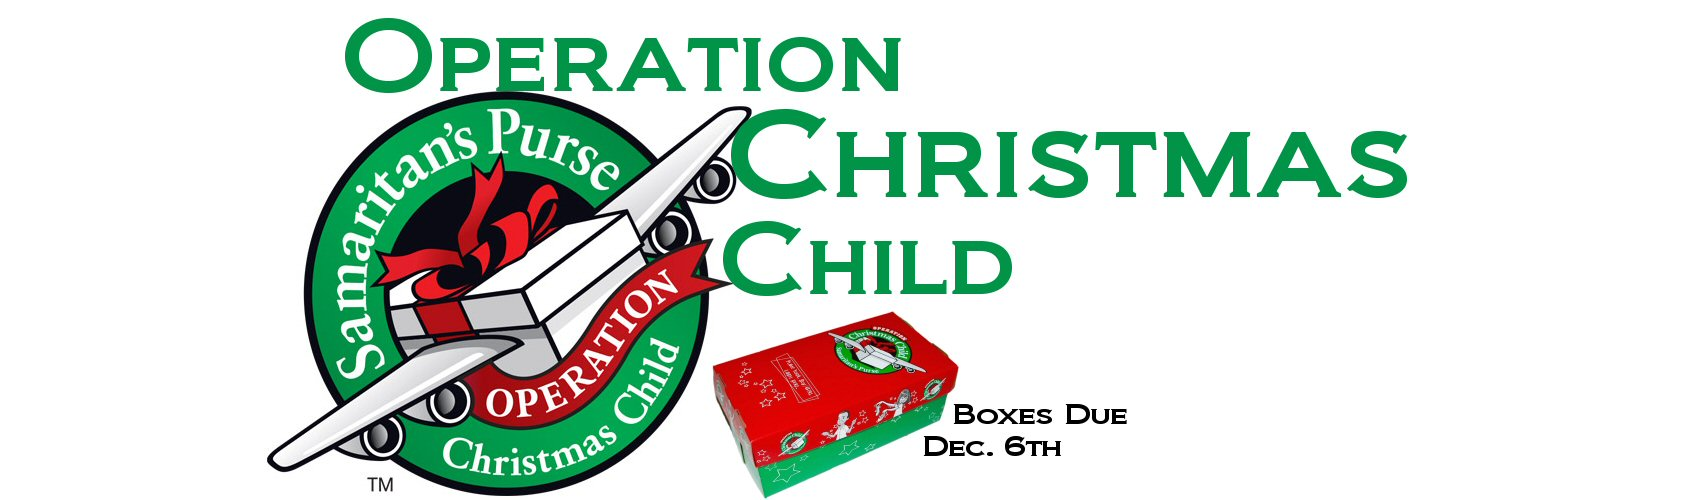 Operation Christmas Child Shoesbox 2020